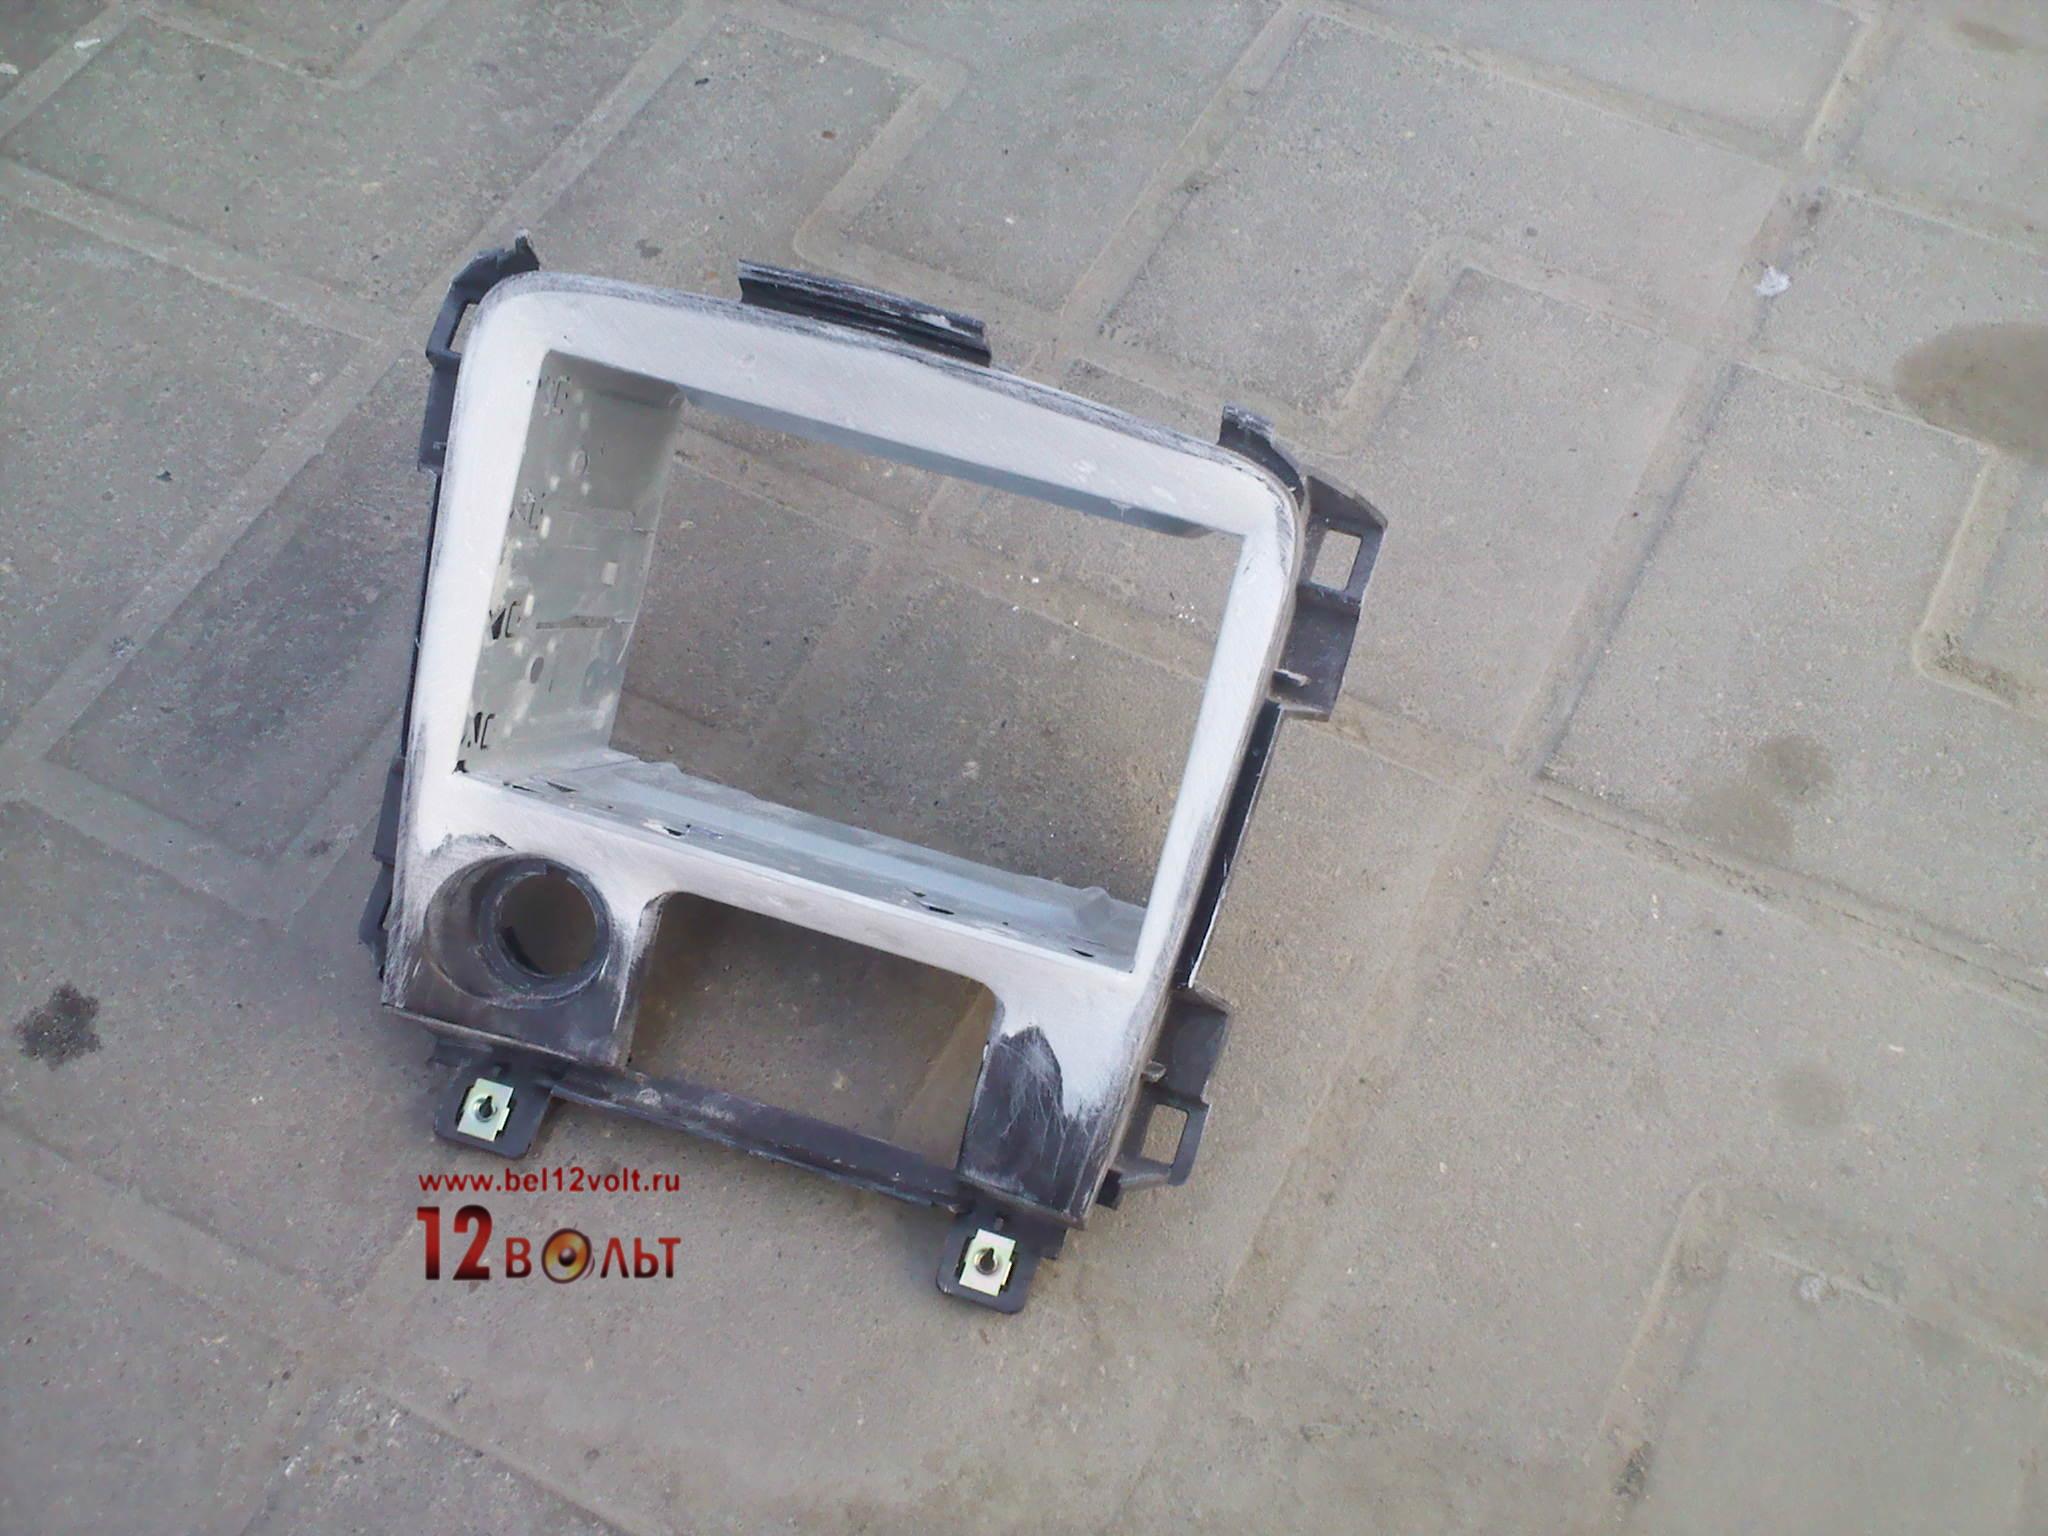 Установка рамки магнитолы своими руками 74